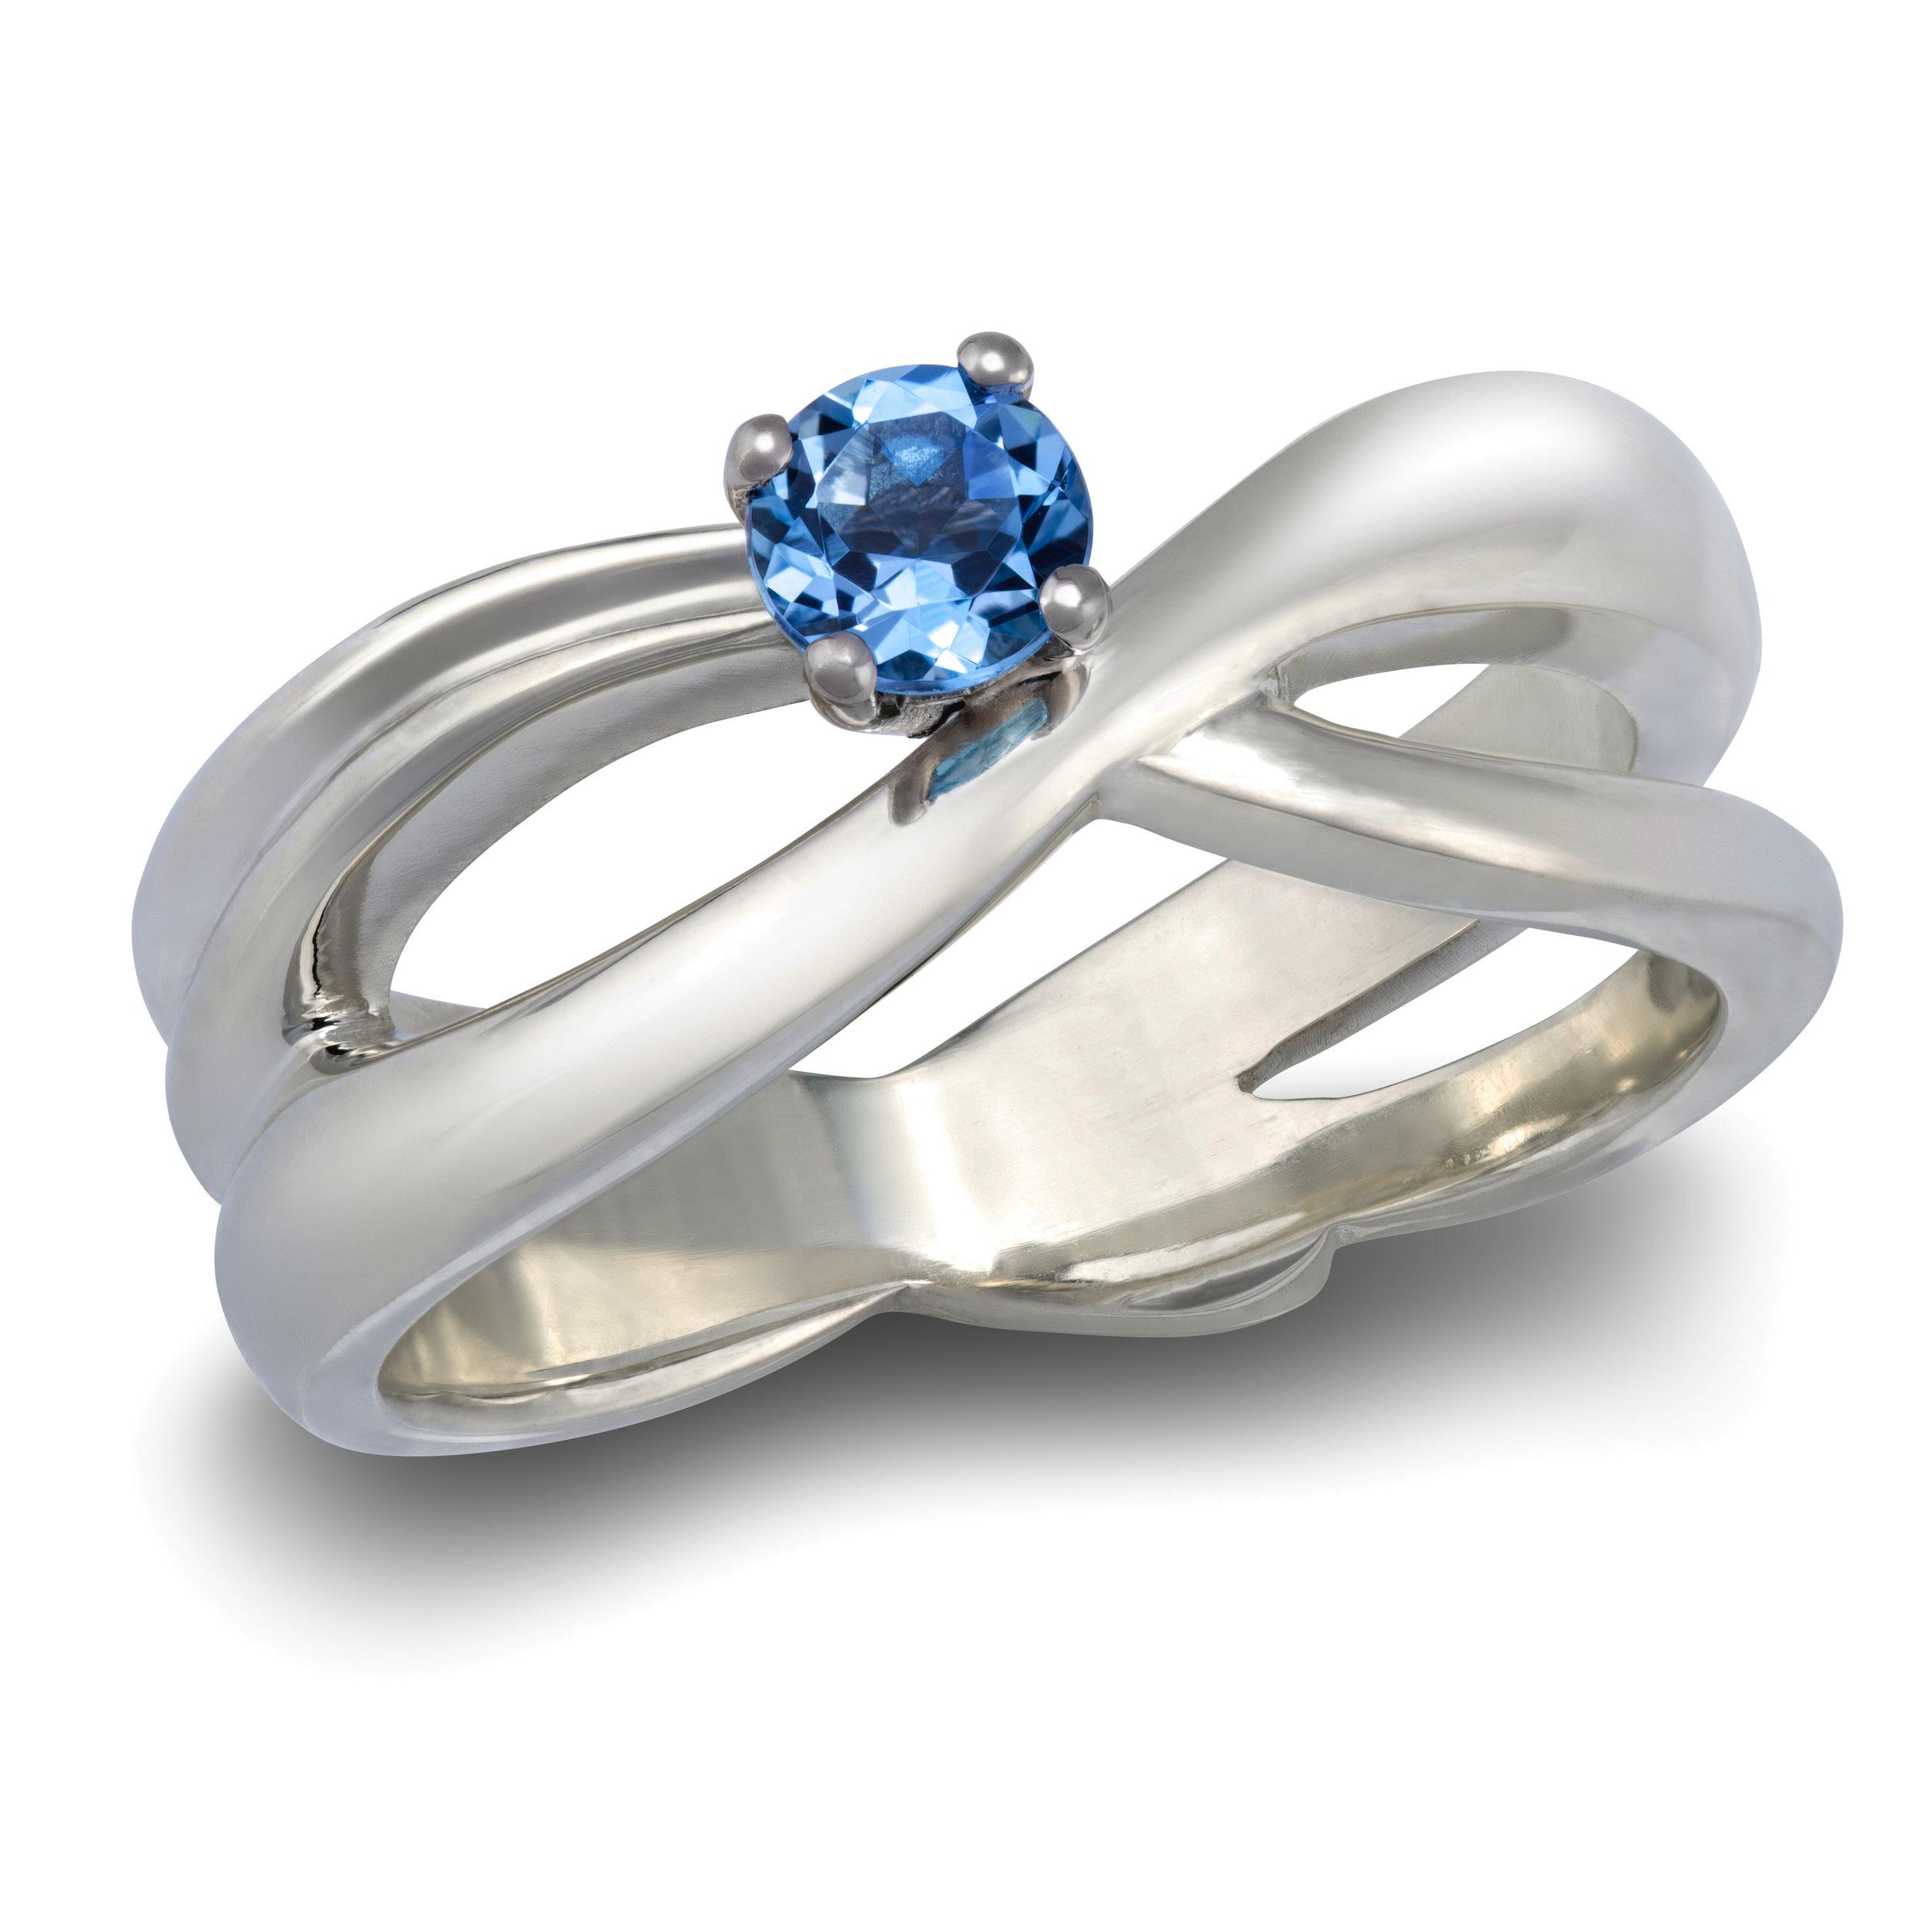 9ct white gold dress ring set with one aquamarine - £1,290